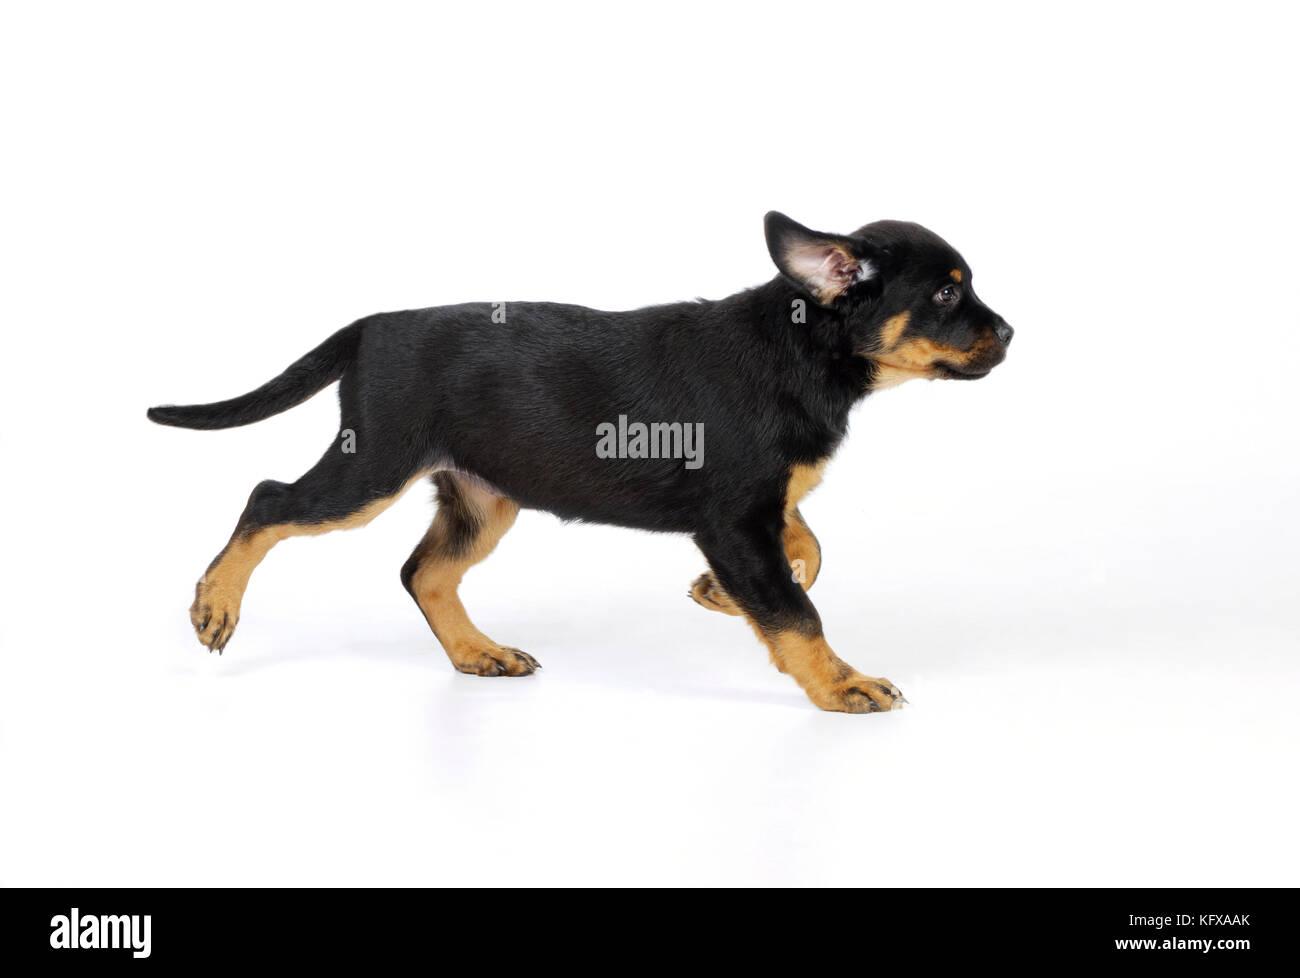 Rottweiler Puppy Stock Photos & Rottweiler Puppy Stock